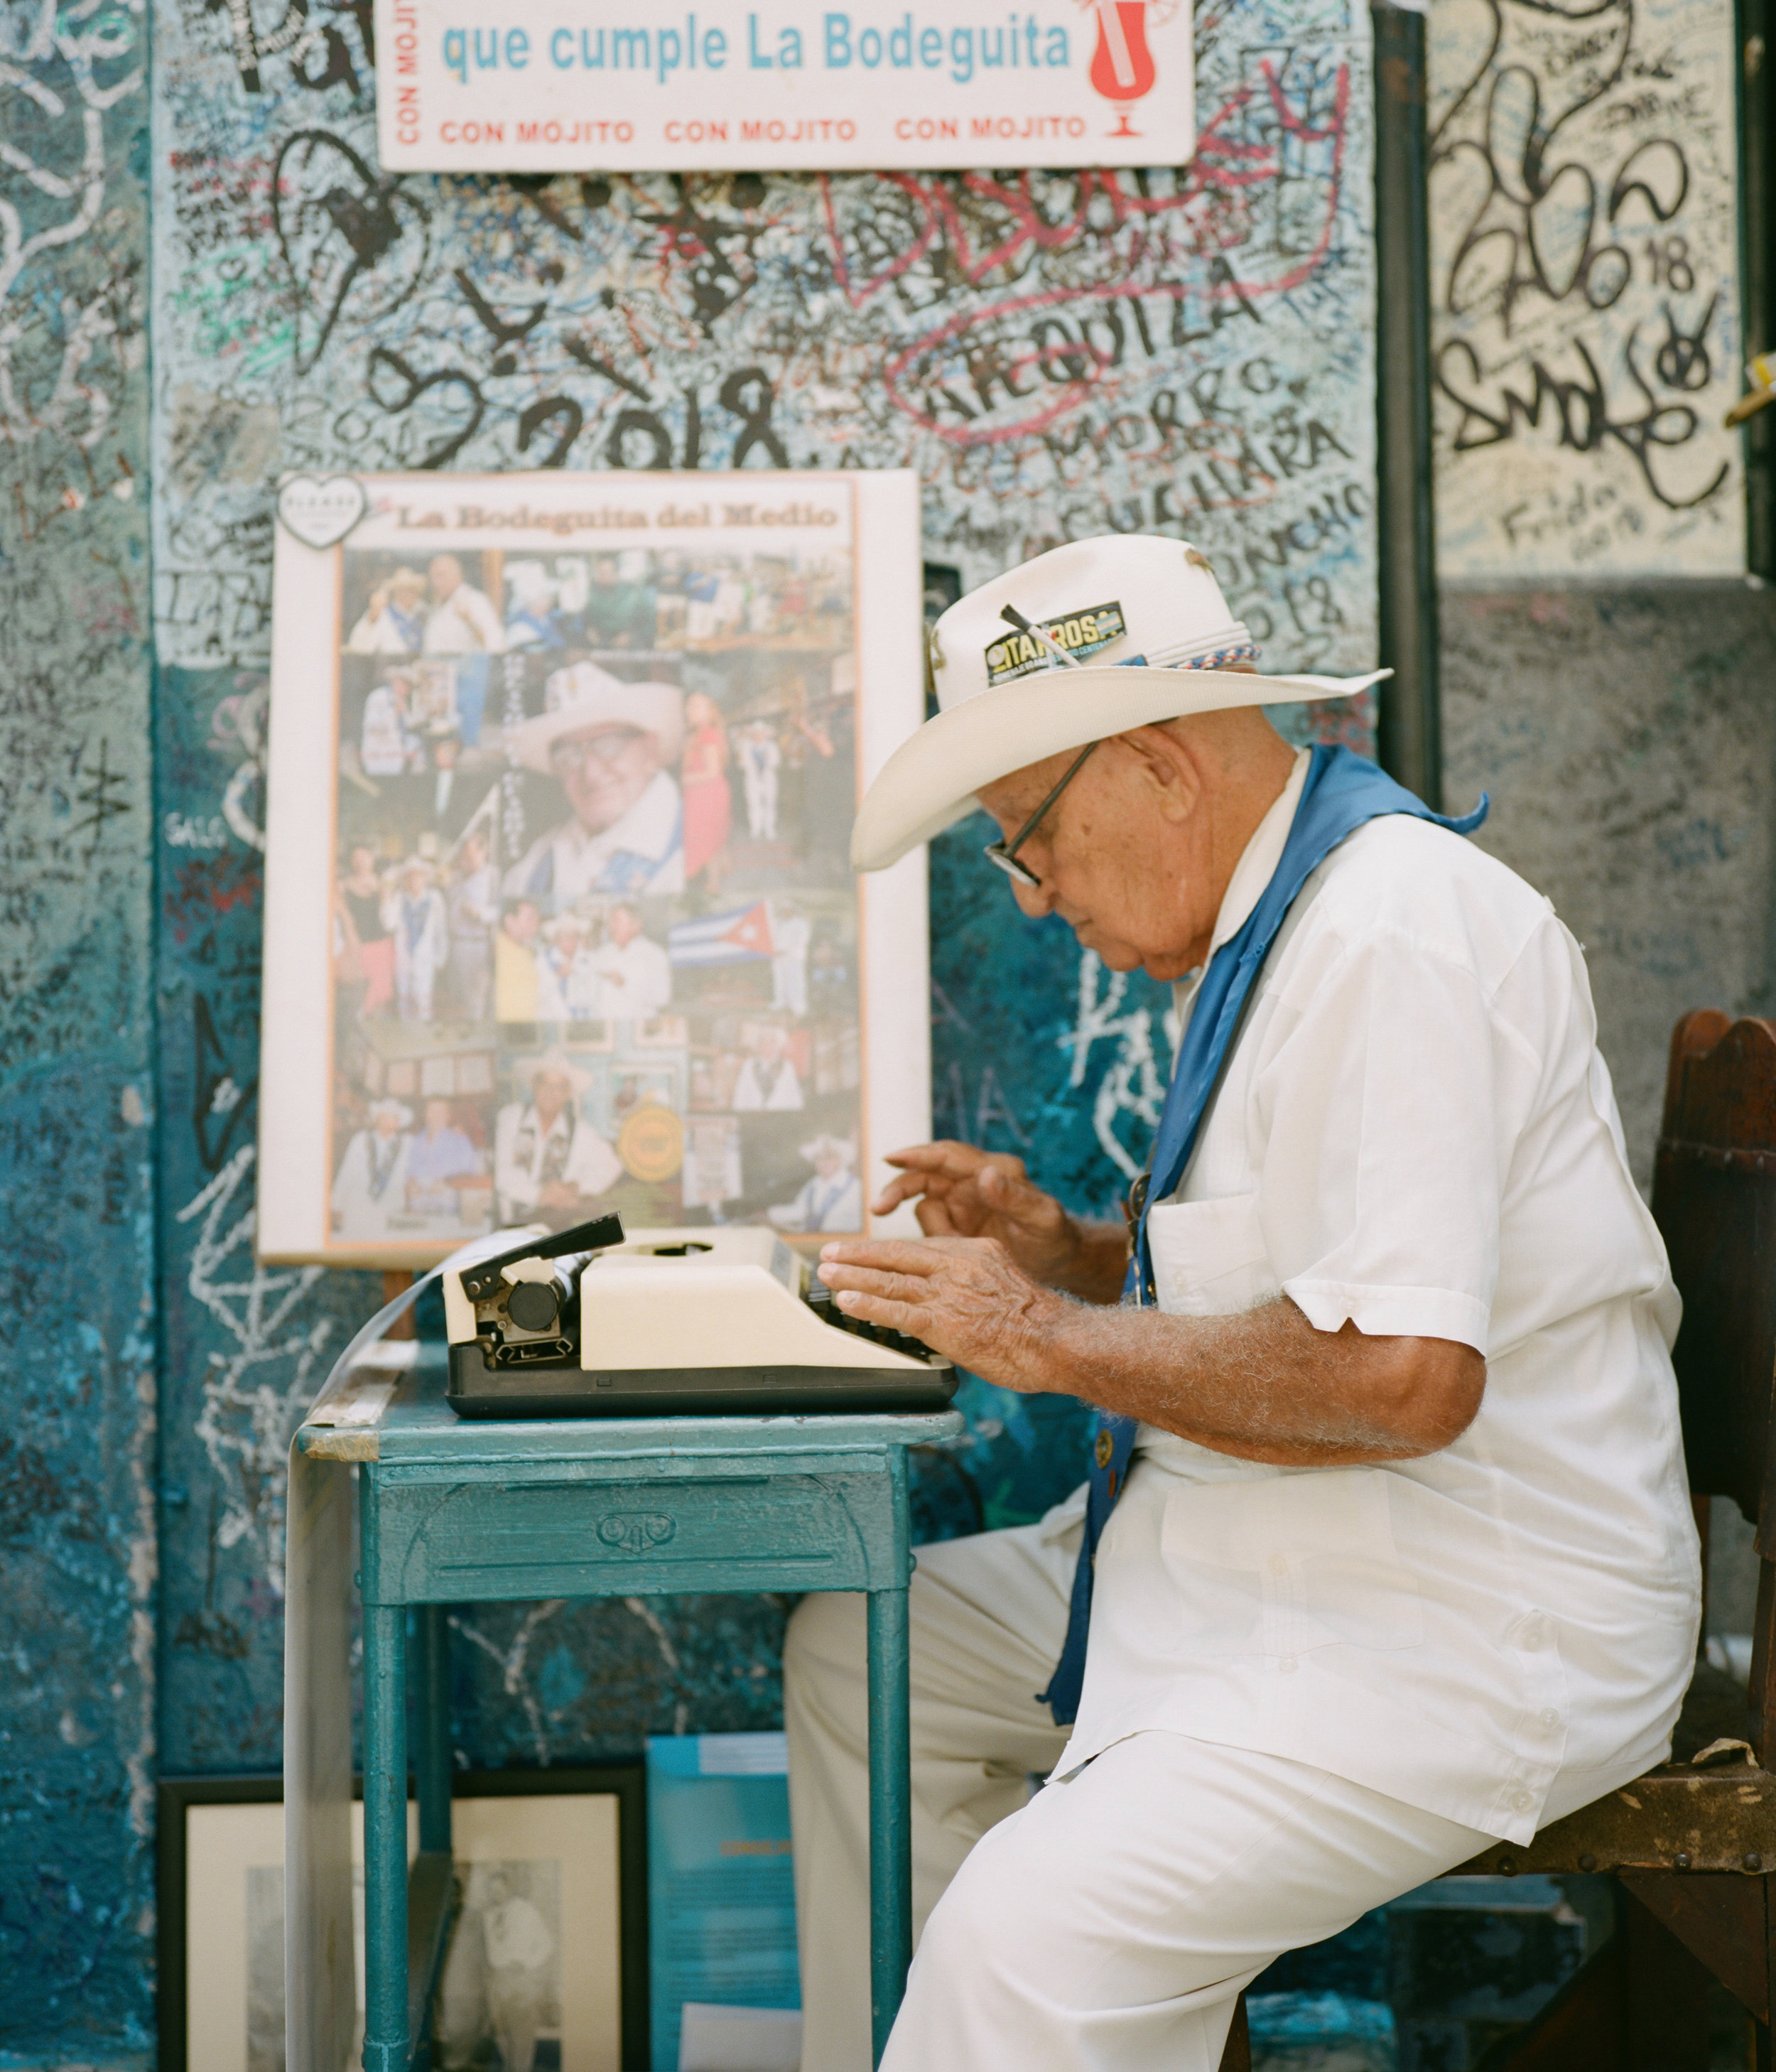 kaytona_kristin aytona_KxN_Cuba-StS-3.jpg